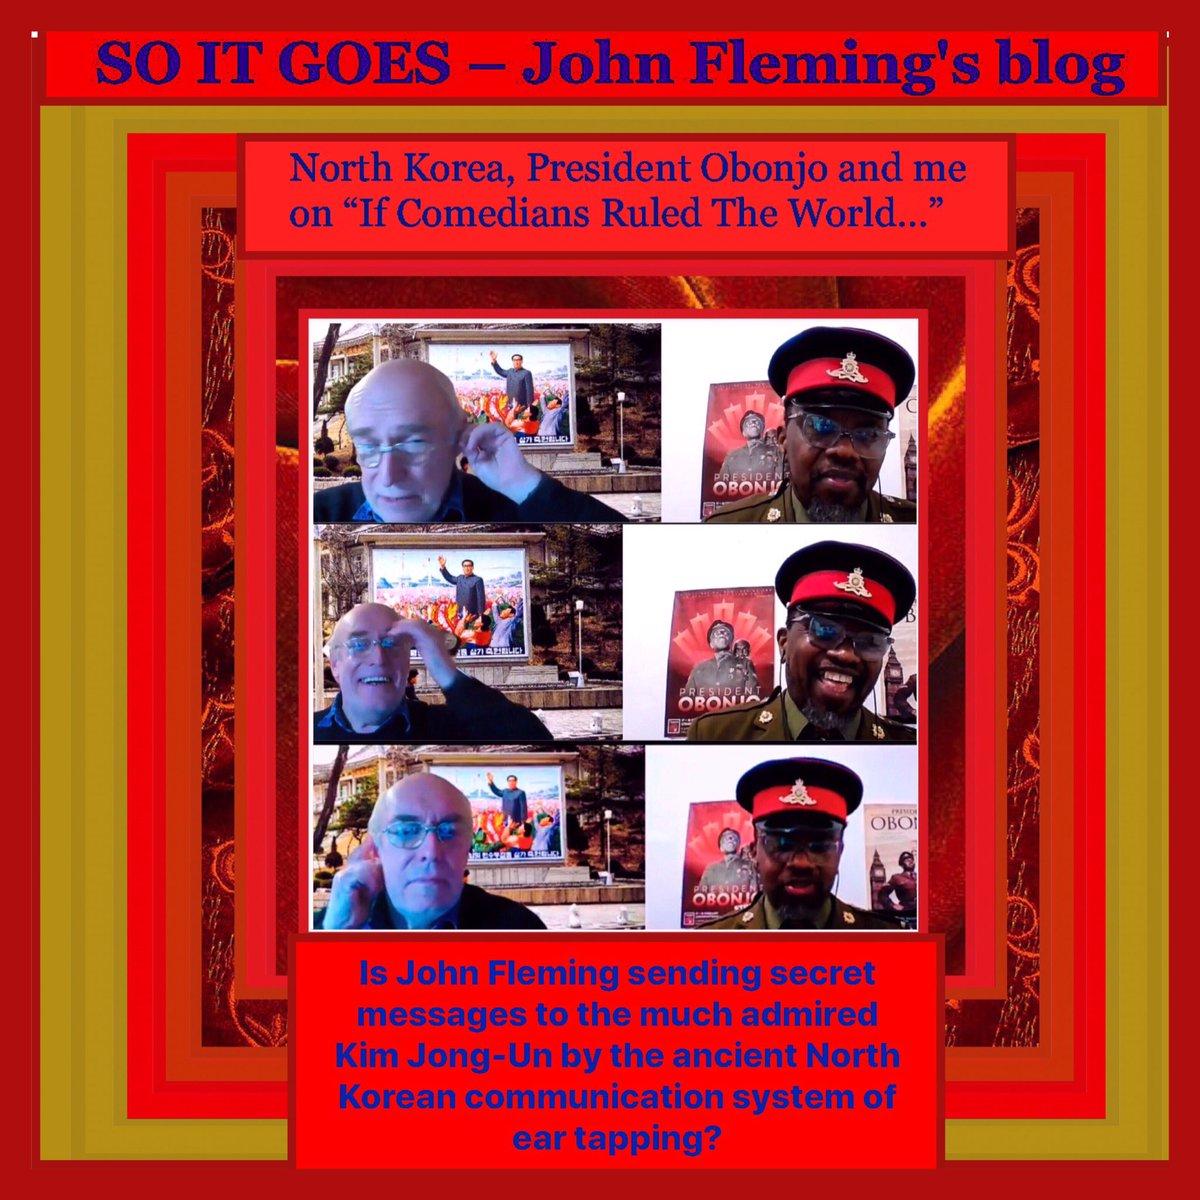 "#NorthKorea, President Obonjo & me on #podcast"" If Comedians Ruled The World...""  #thejohnfleming #blog  #toronto #vancouver #montreal #ottawa #calgary #quebec #winnipeg #edmonton #victoria #hamilton #regina #uk #presidentobonjo #ifcomediansruledtheworld   https://t.co/gpiBvWduCl https://t.co/S3HQRoXLDd"